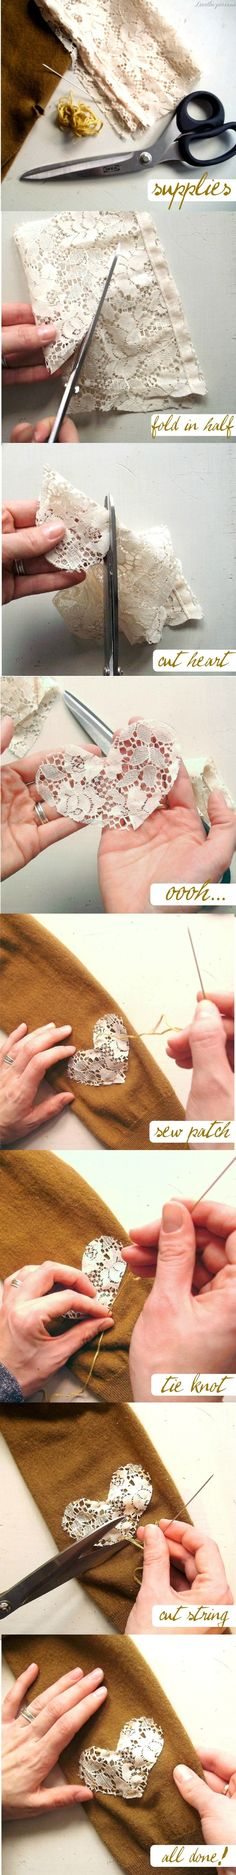 lace heart, diy ideas, sweater, fashion, craft